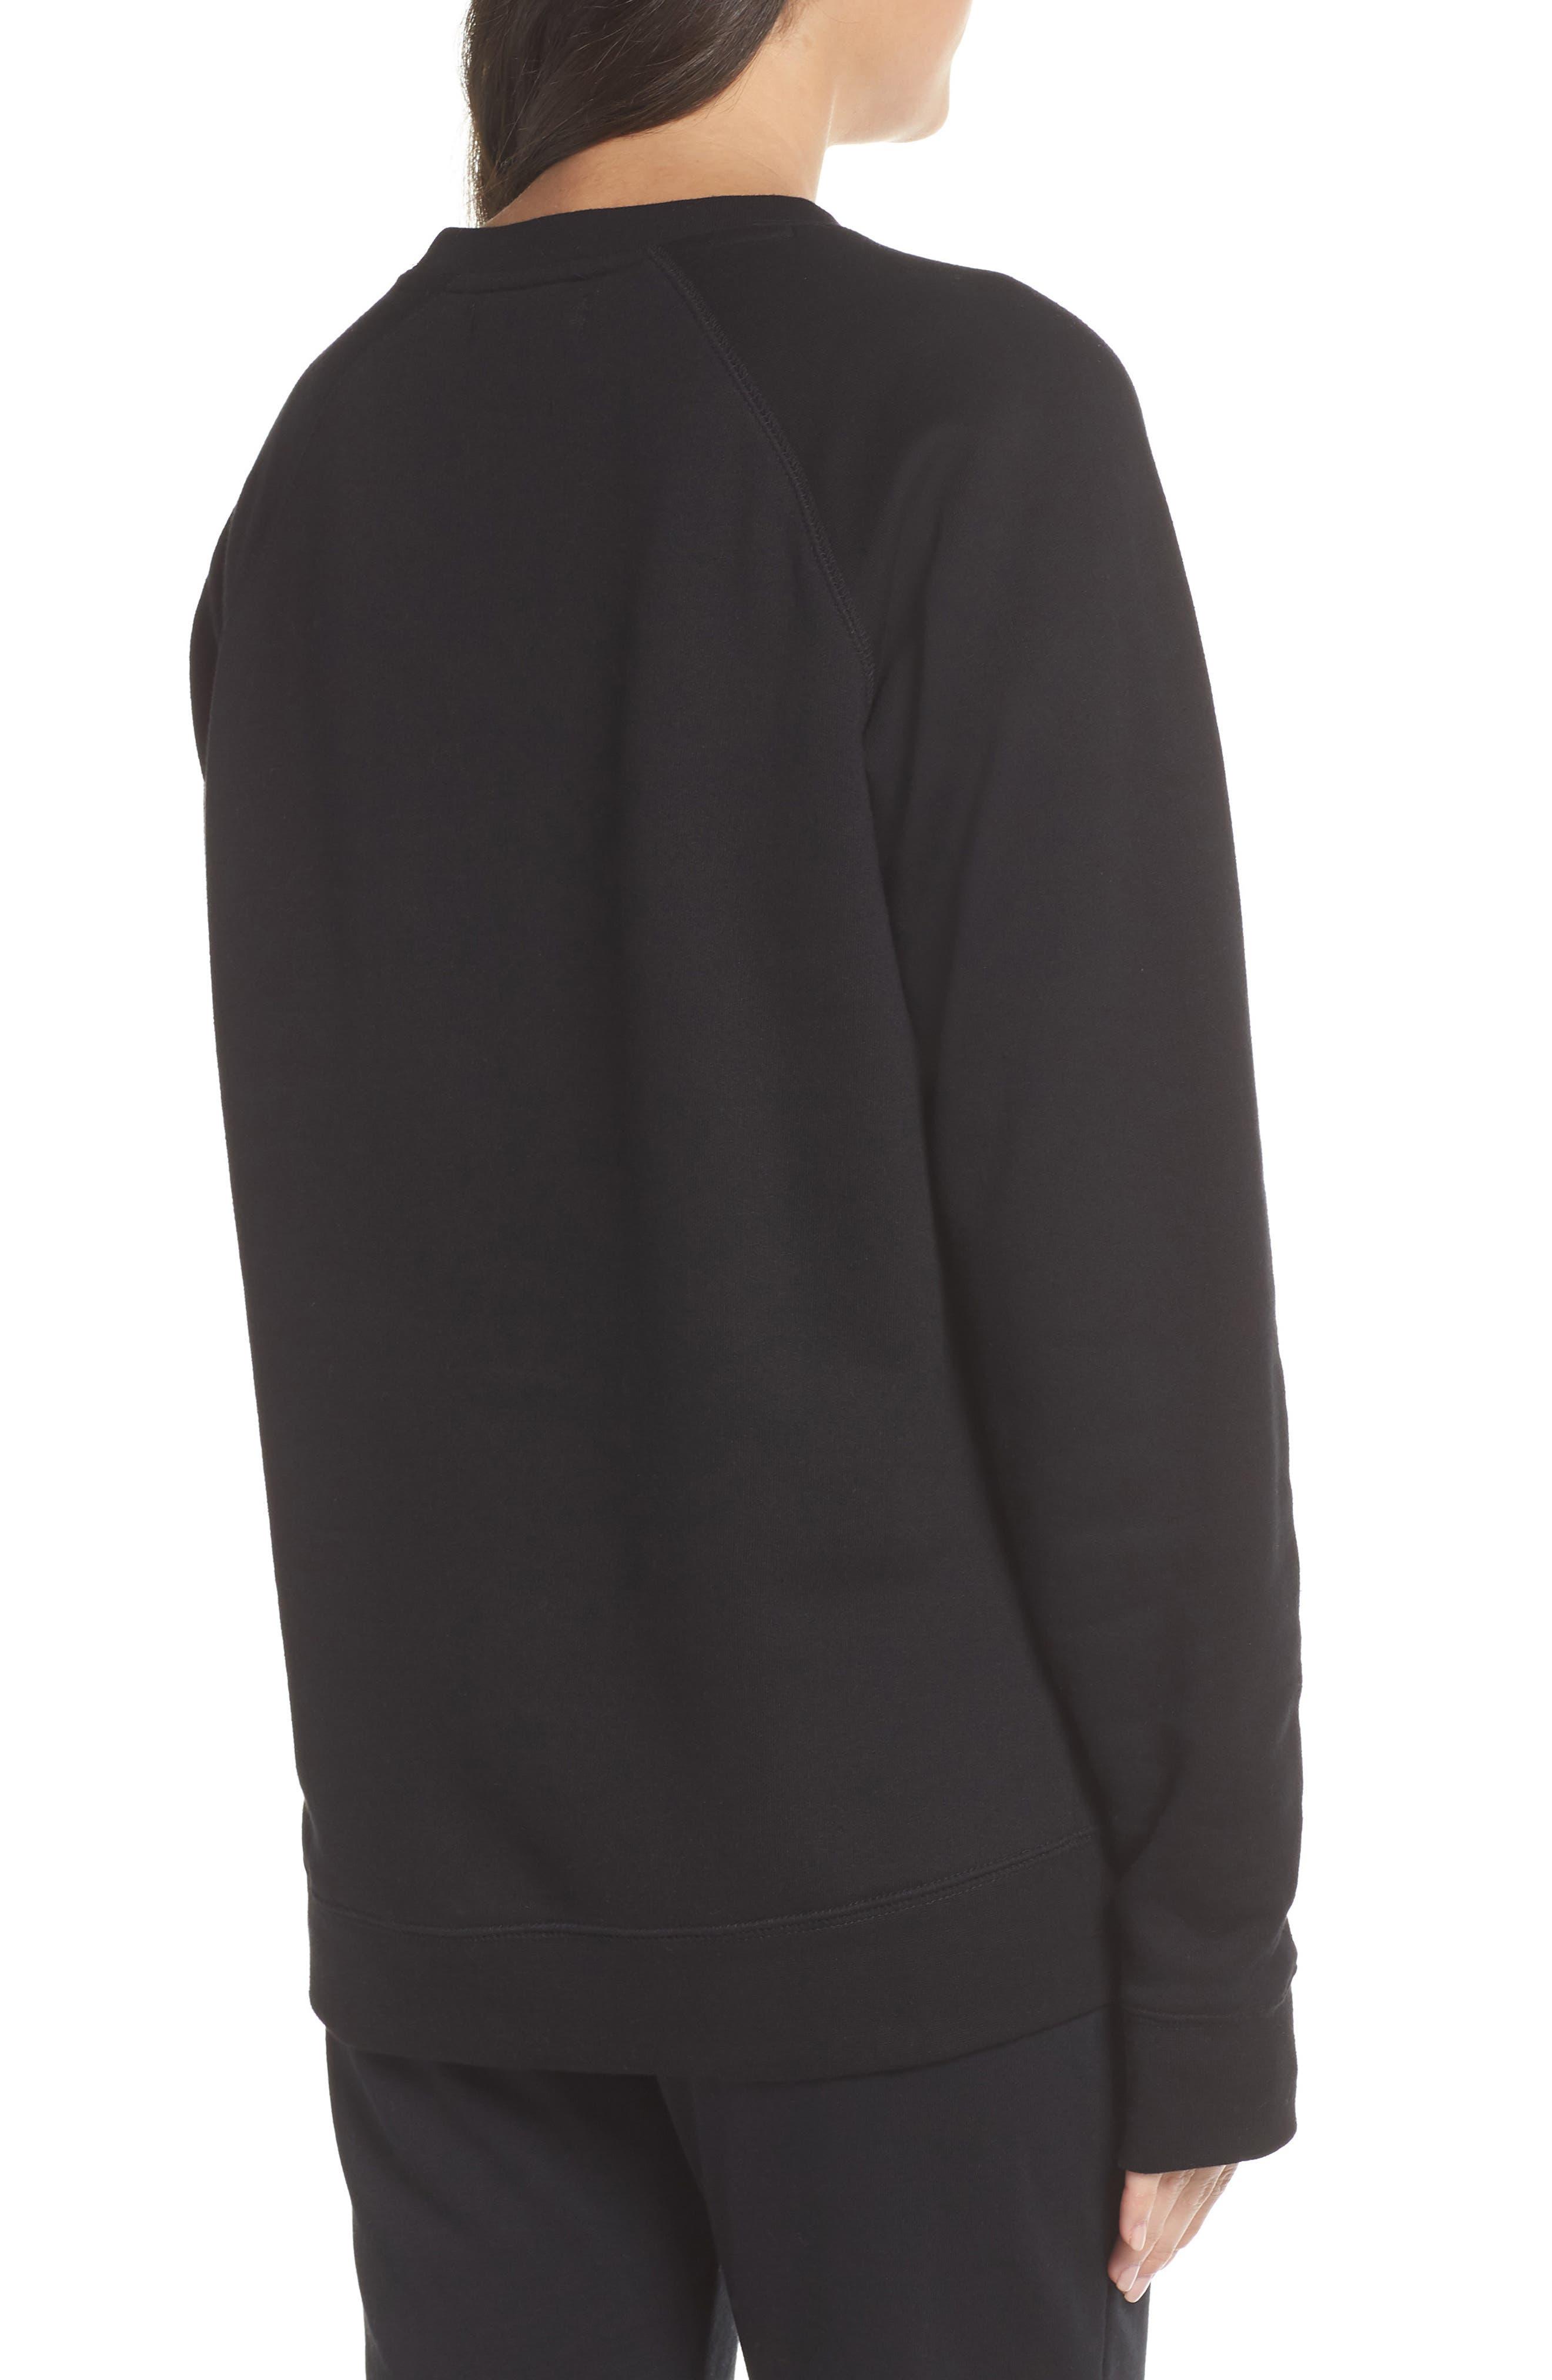 Rosé Okay Sweatshirt,                             Alternate thumbnail 2, color,                             BLACK